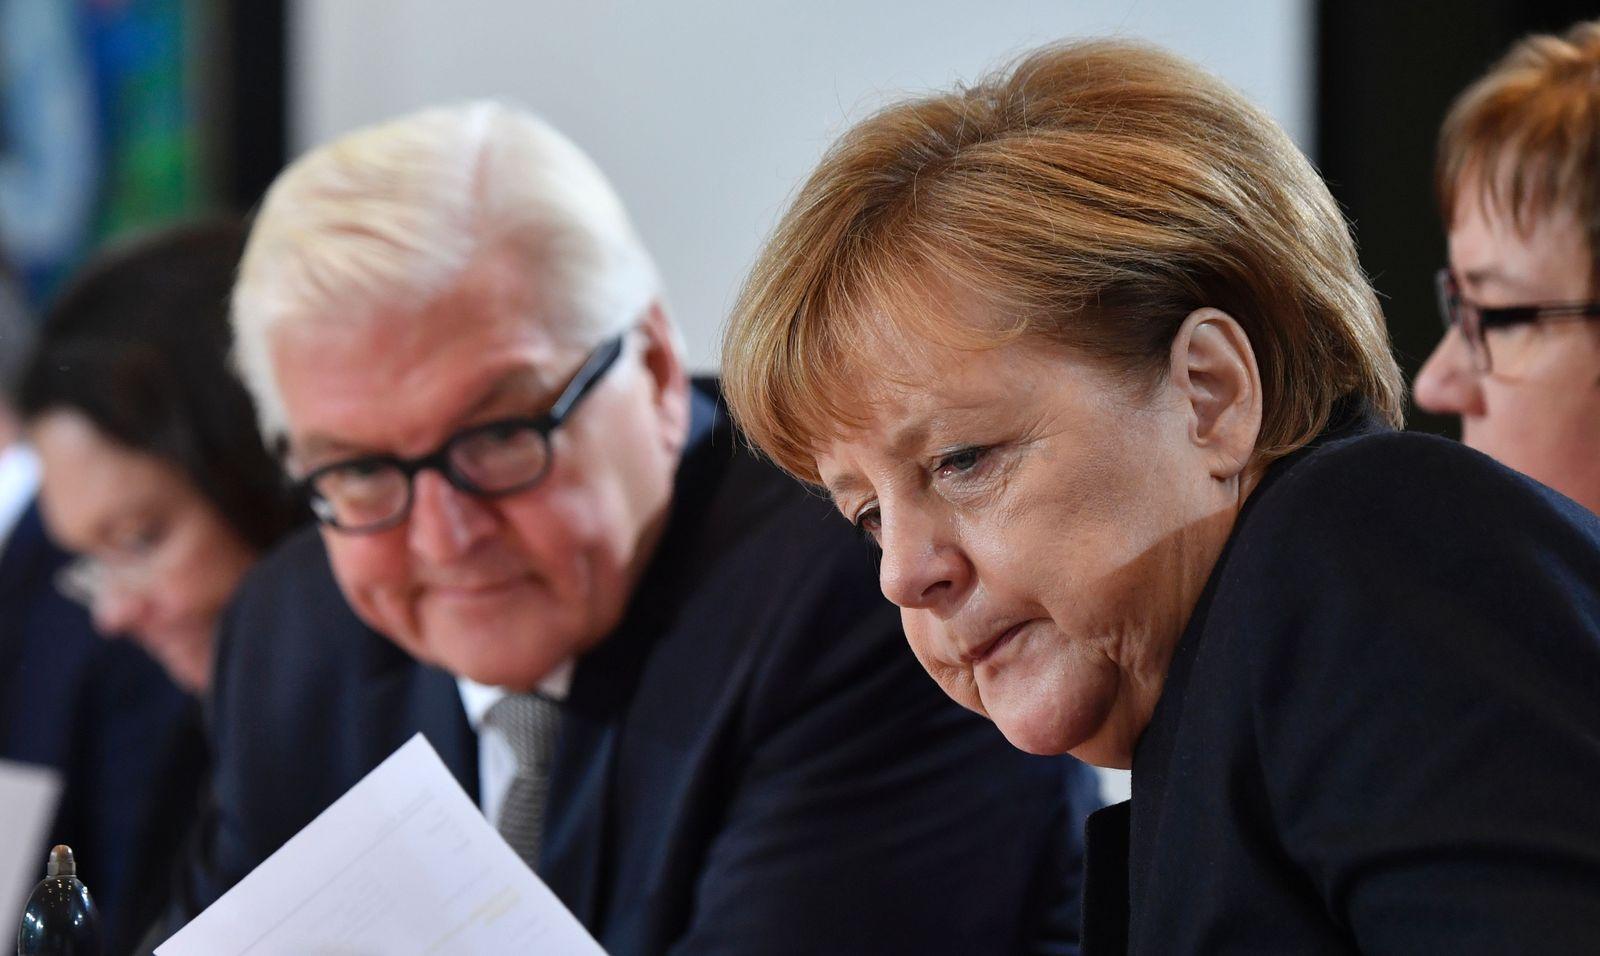 Angela Merkel / Frank-Walter Steinmeier